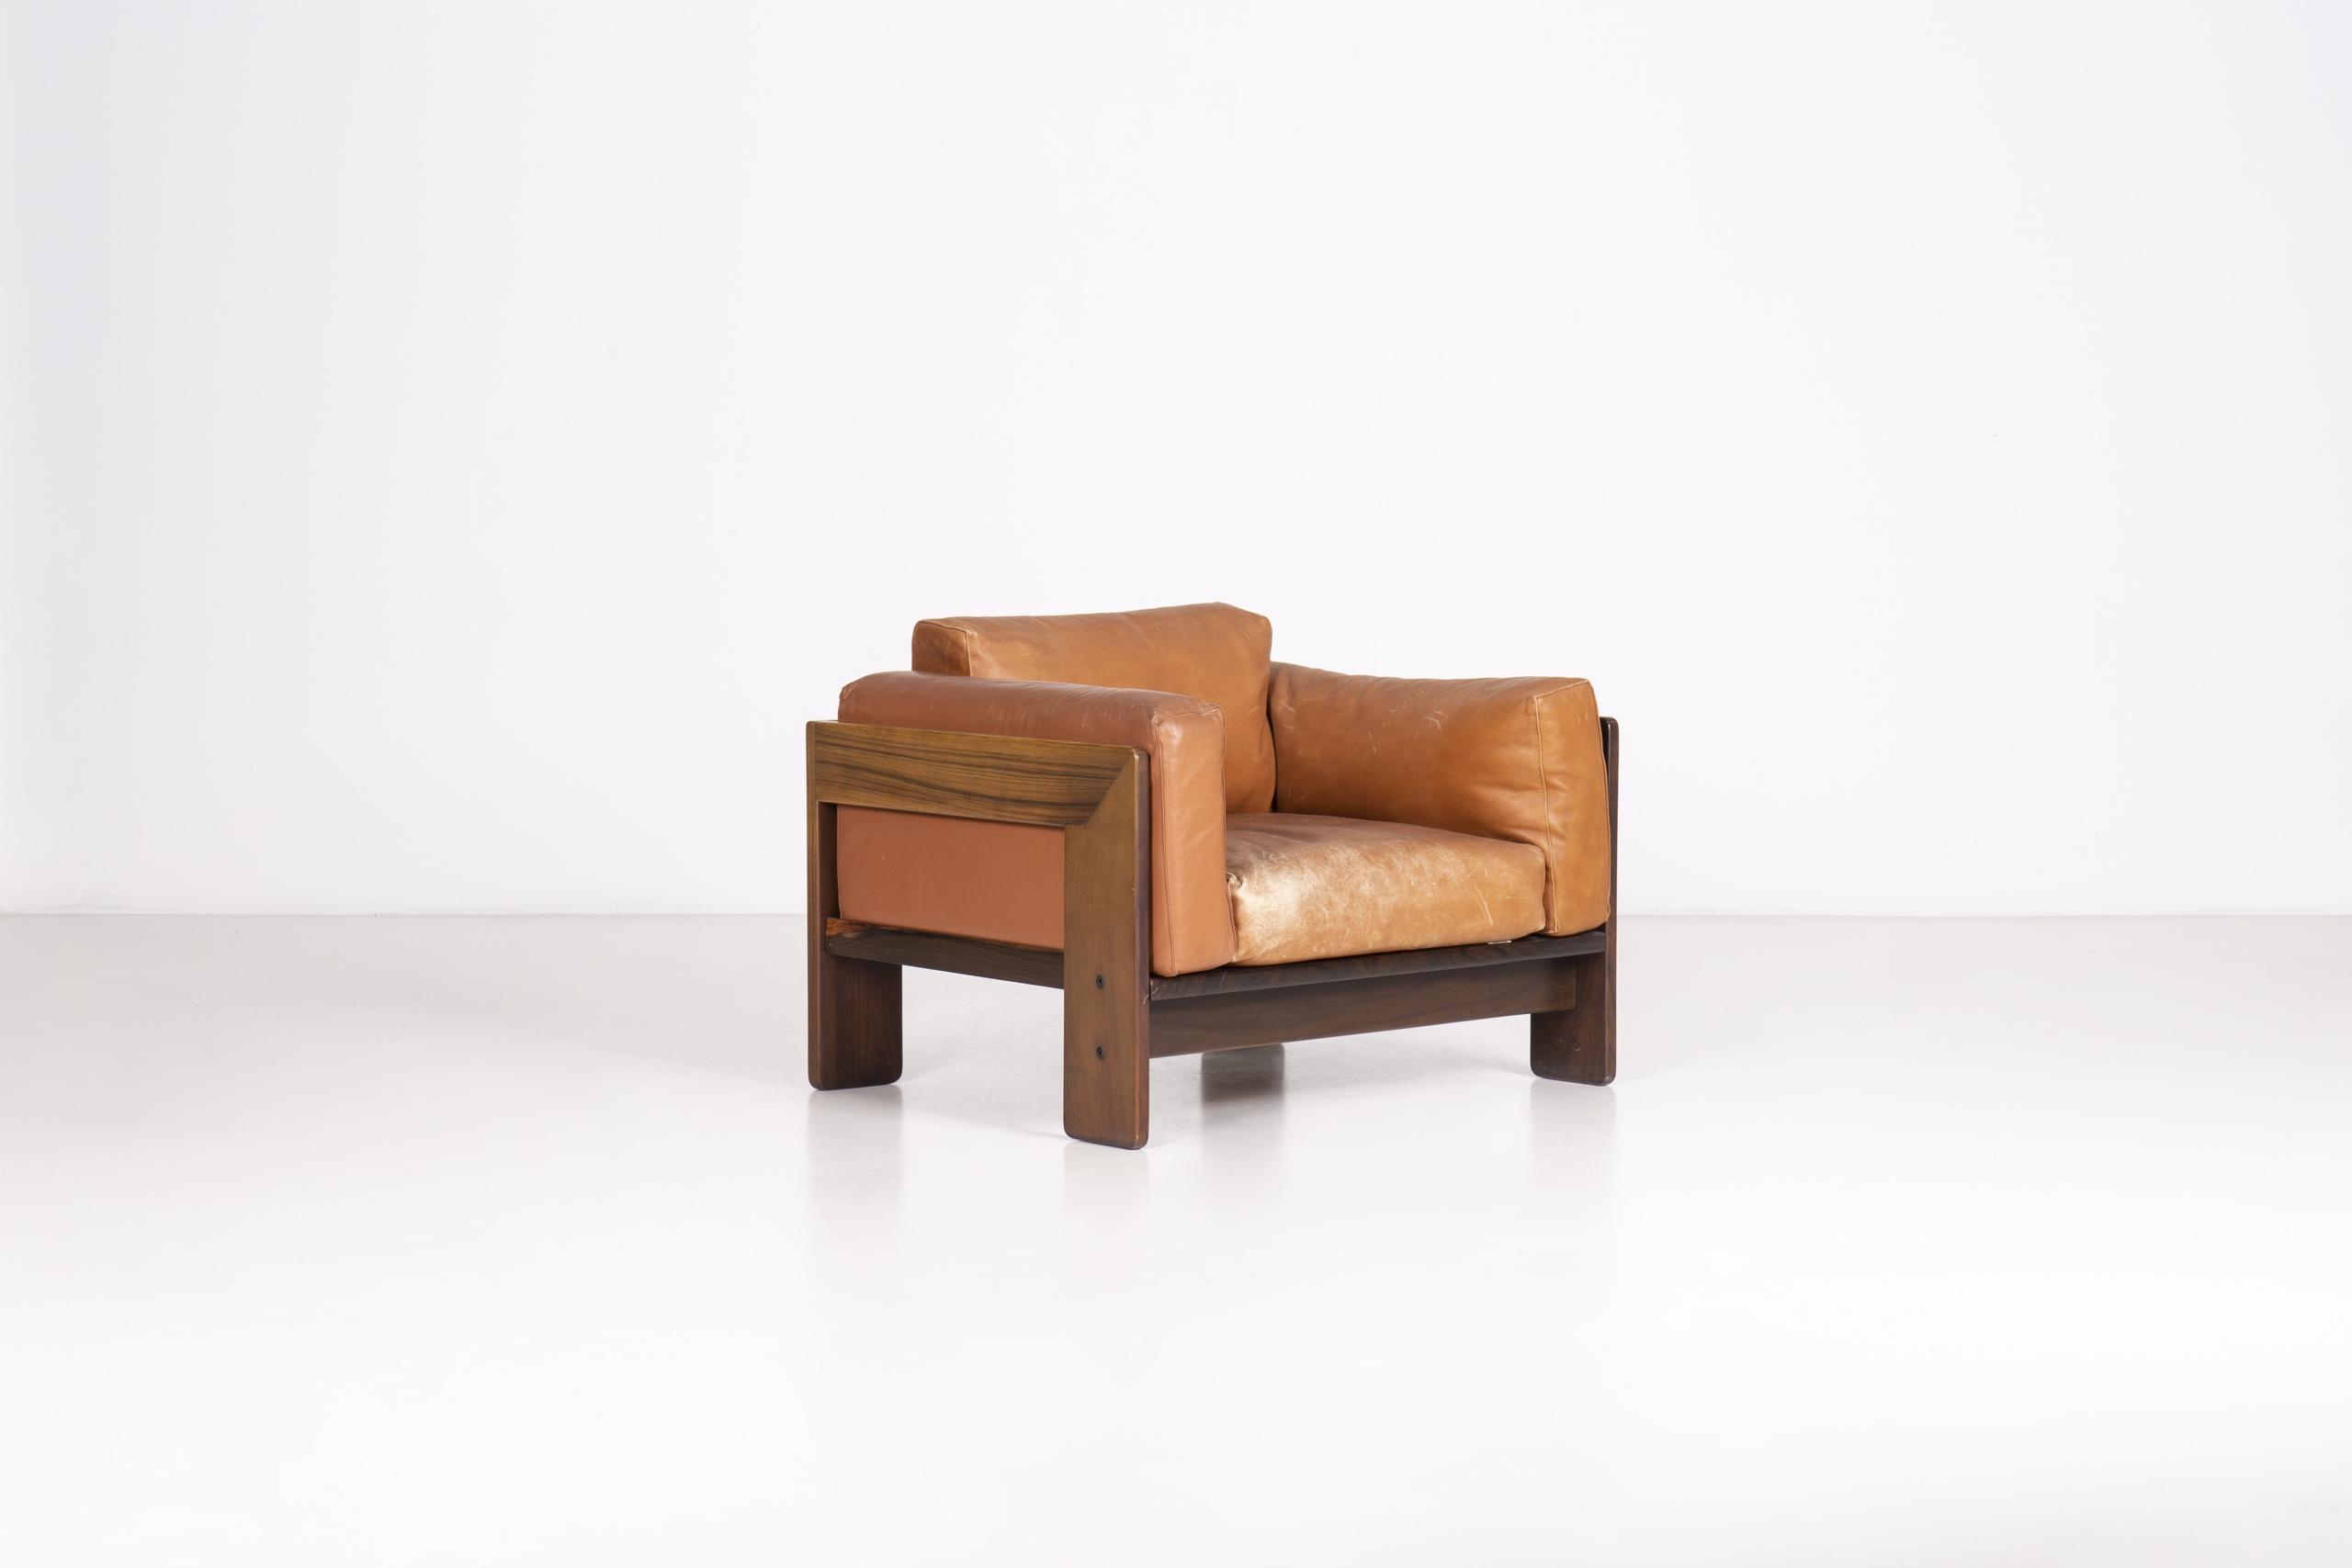 Bastiano armchair by Tobia Scarpa | Paradisoterrestre